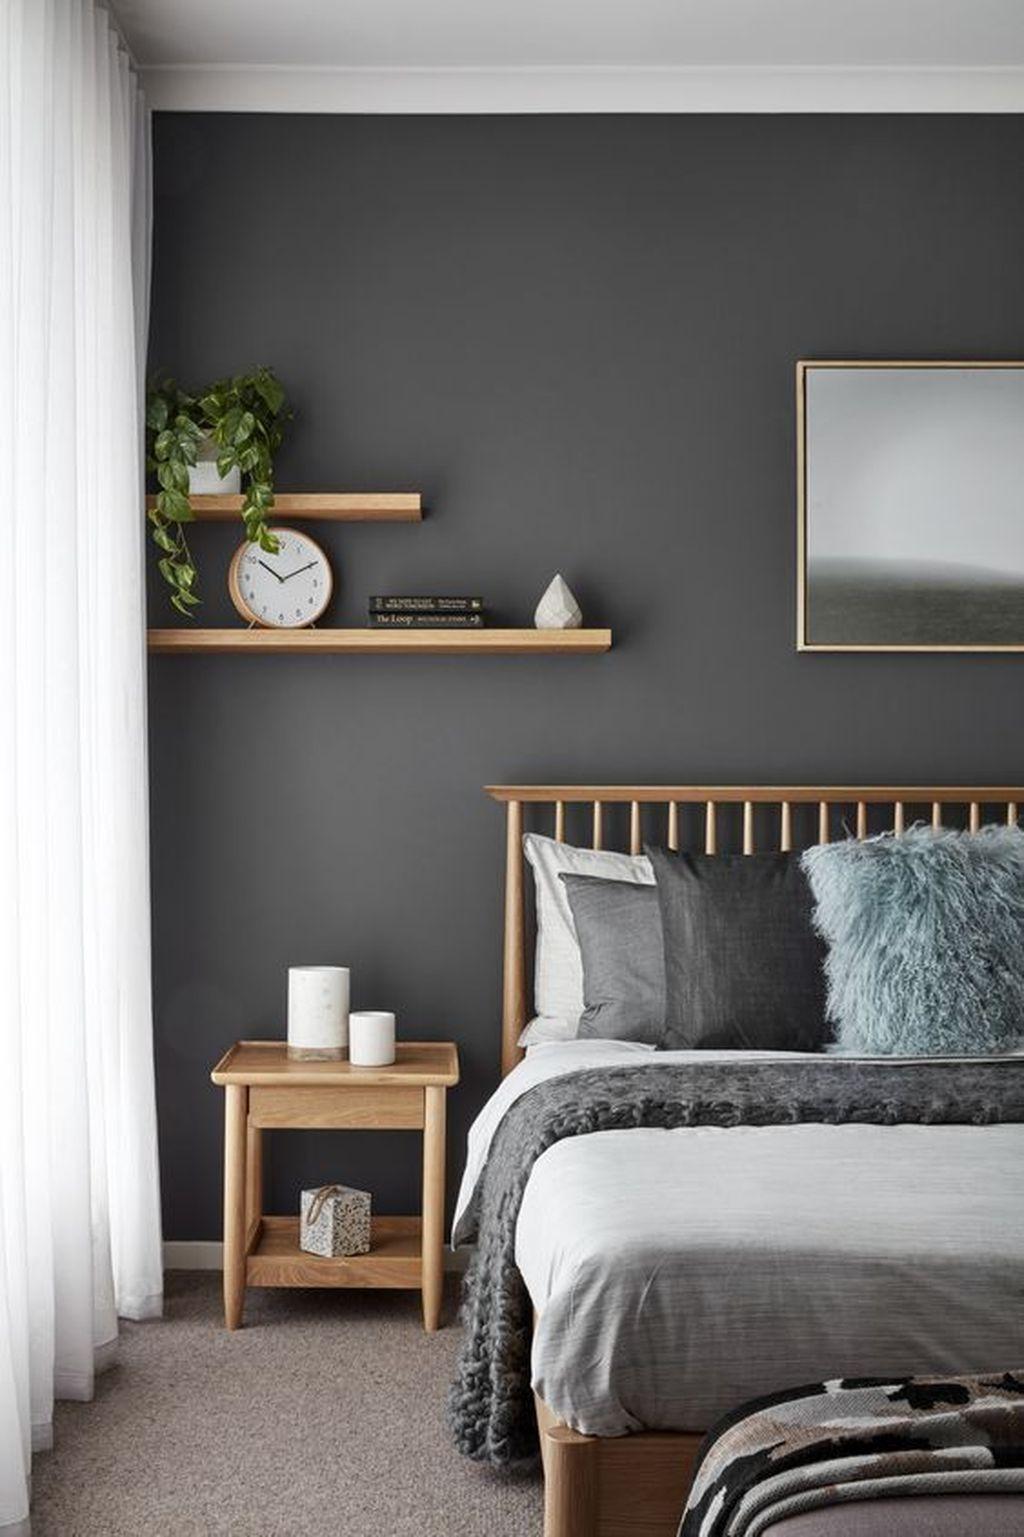 33 Admirable Small Bedroom Decor Ideas You Never Seen Before Homyhomee Interior Soverom Soverom Interior Soverom Dekor